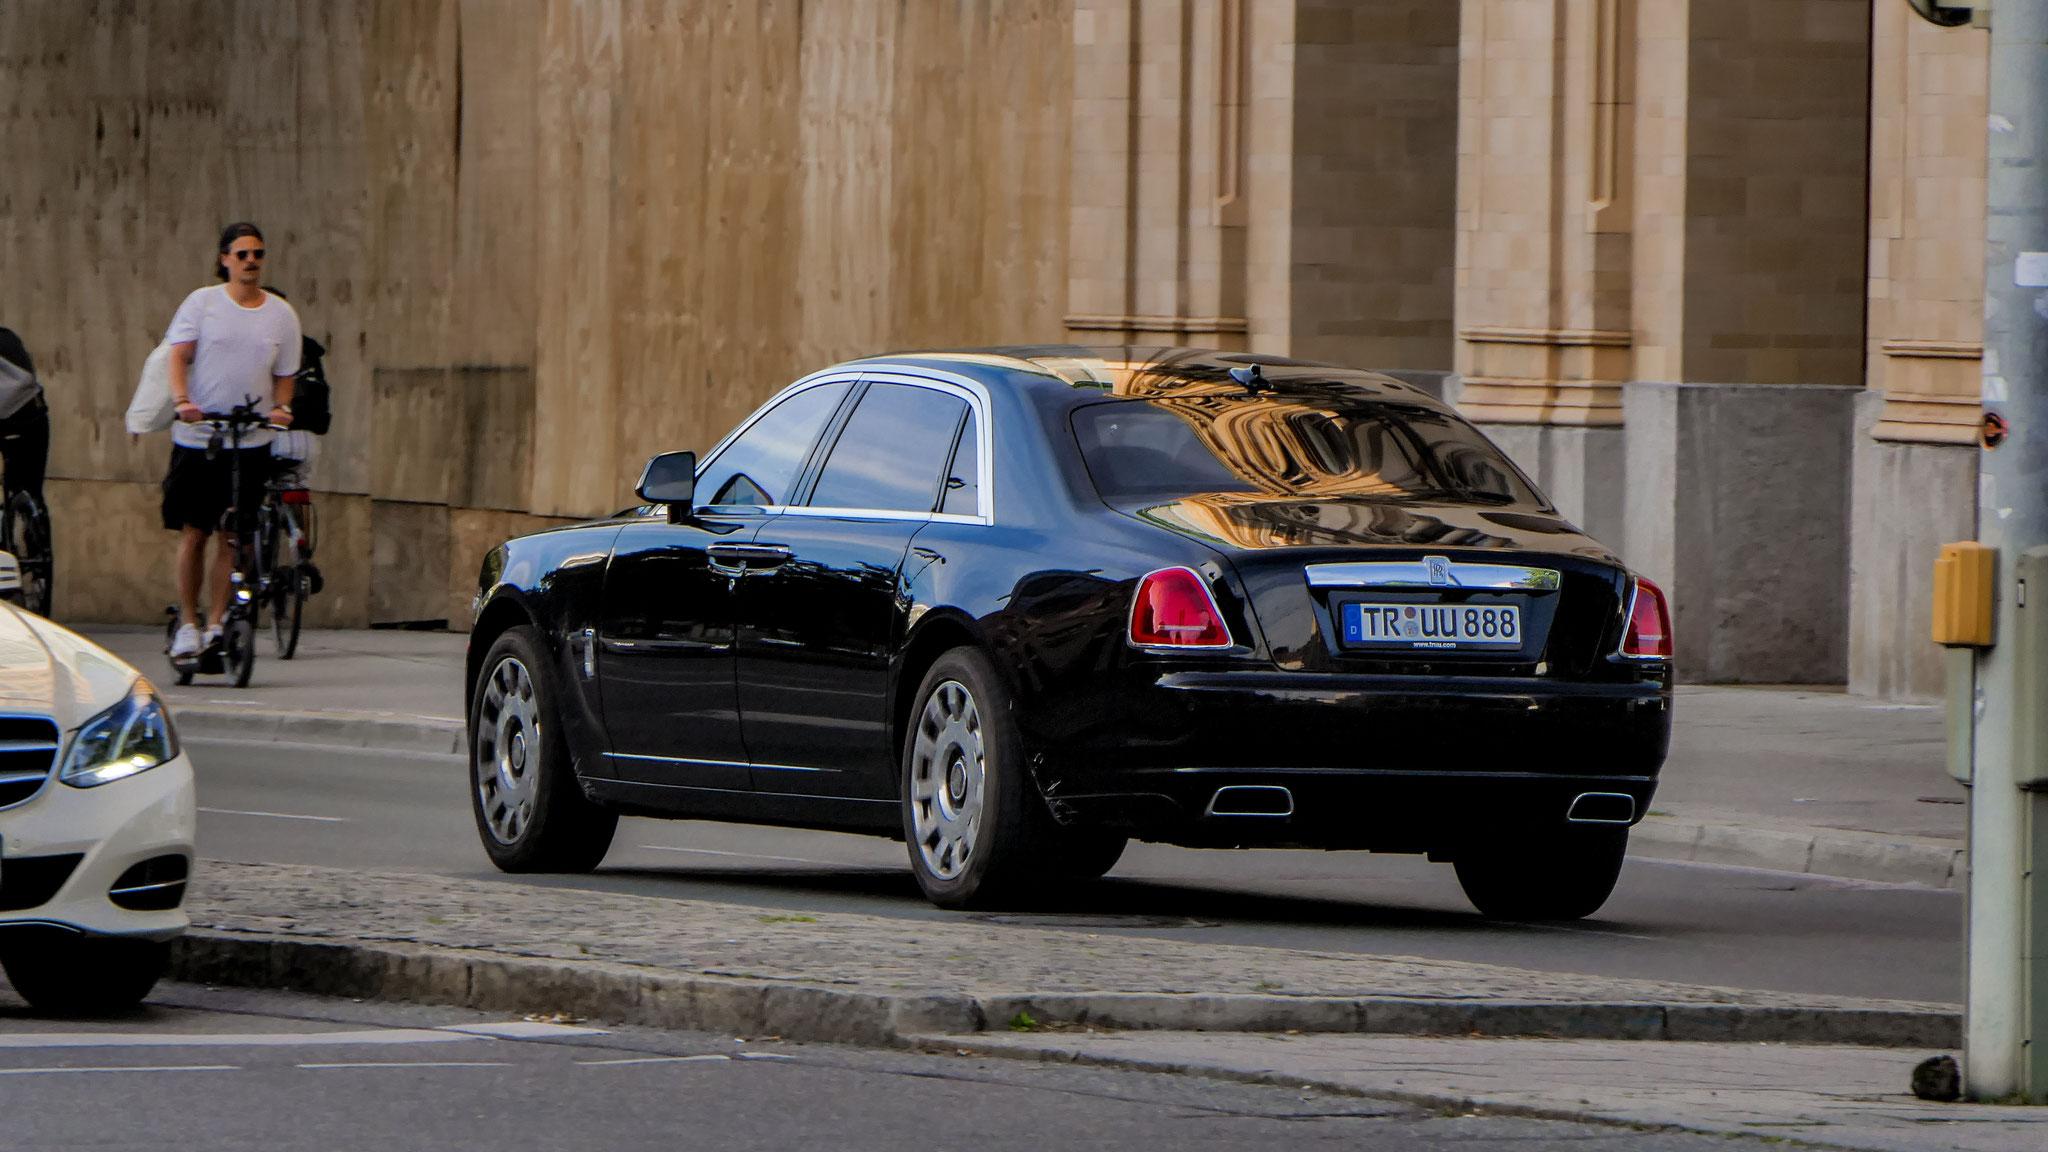 Rolls Royce Ghost Series II - TR-UU-888